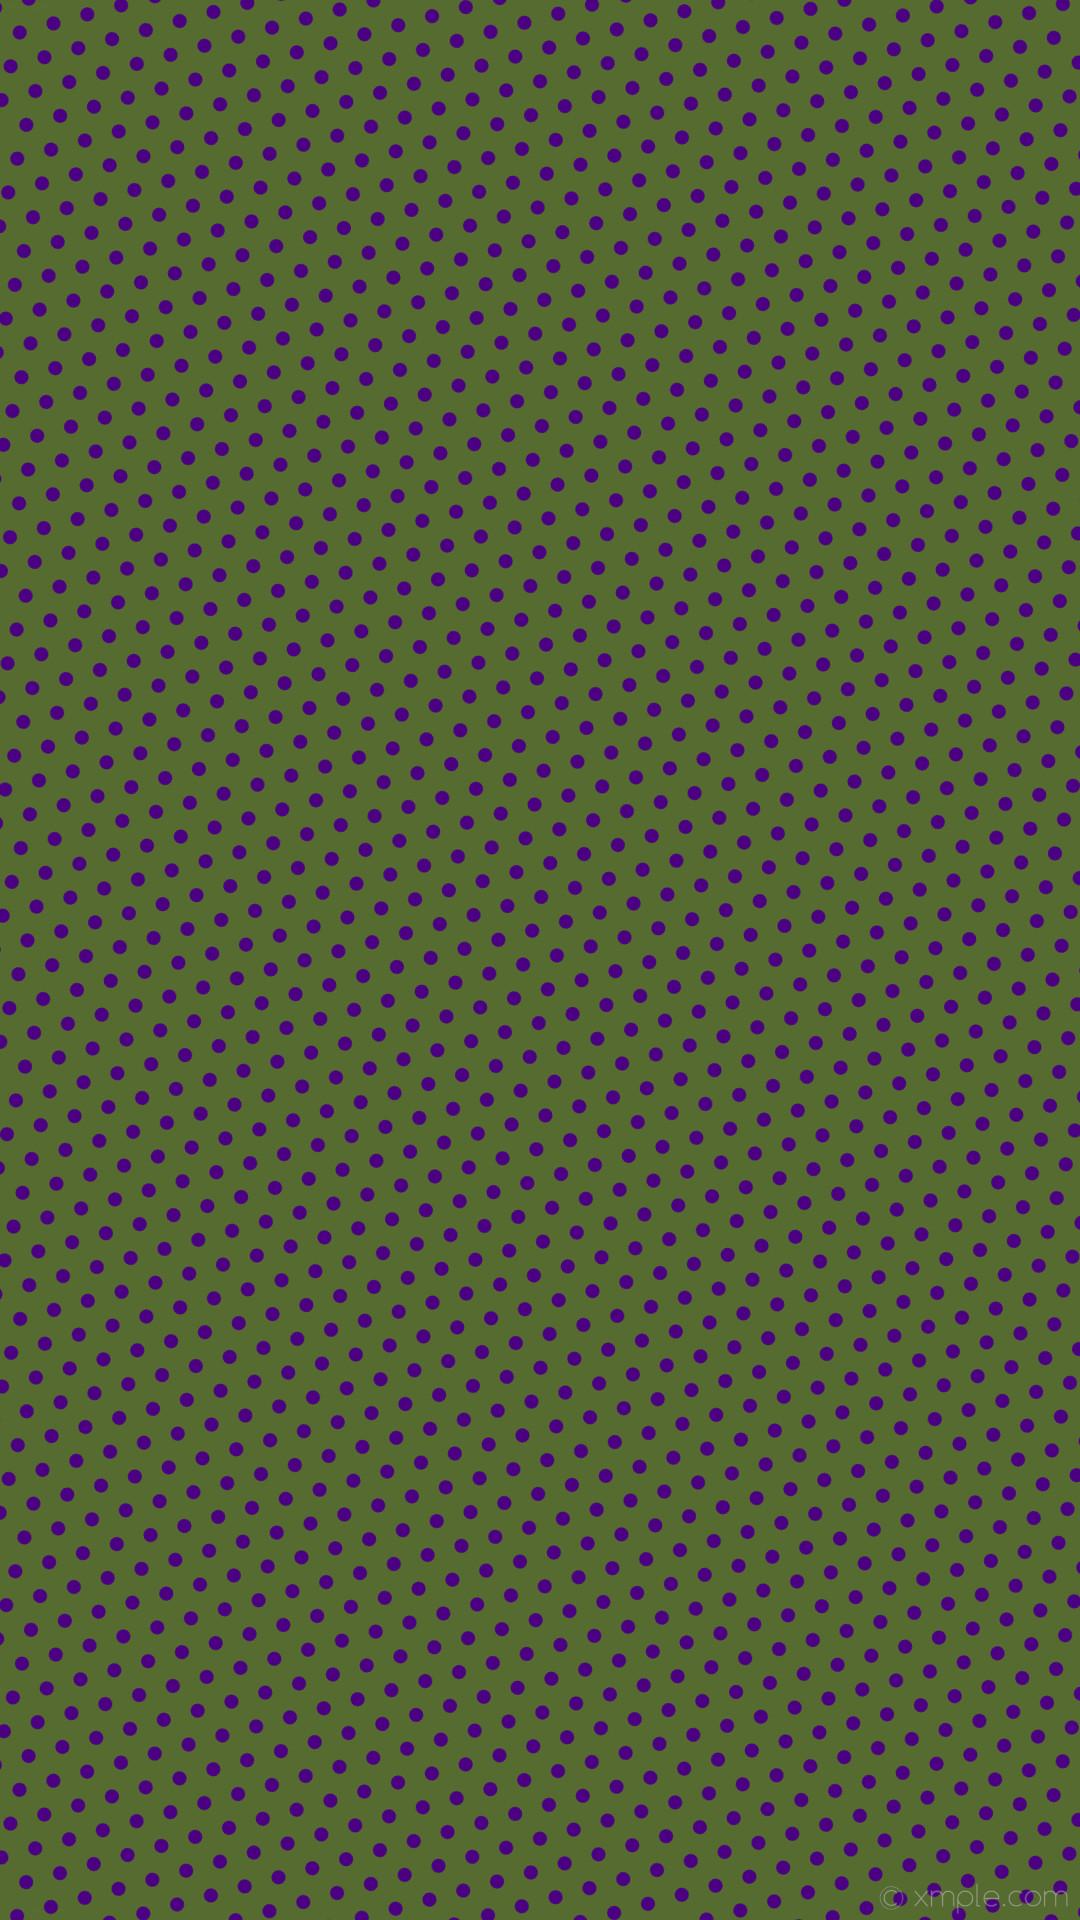 Res: 1080x1920, wallpaper green polka hexagon purple dots dark olive green indigo #556b2f  #4b0082 diagonal 15